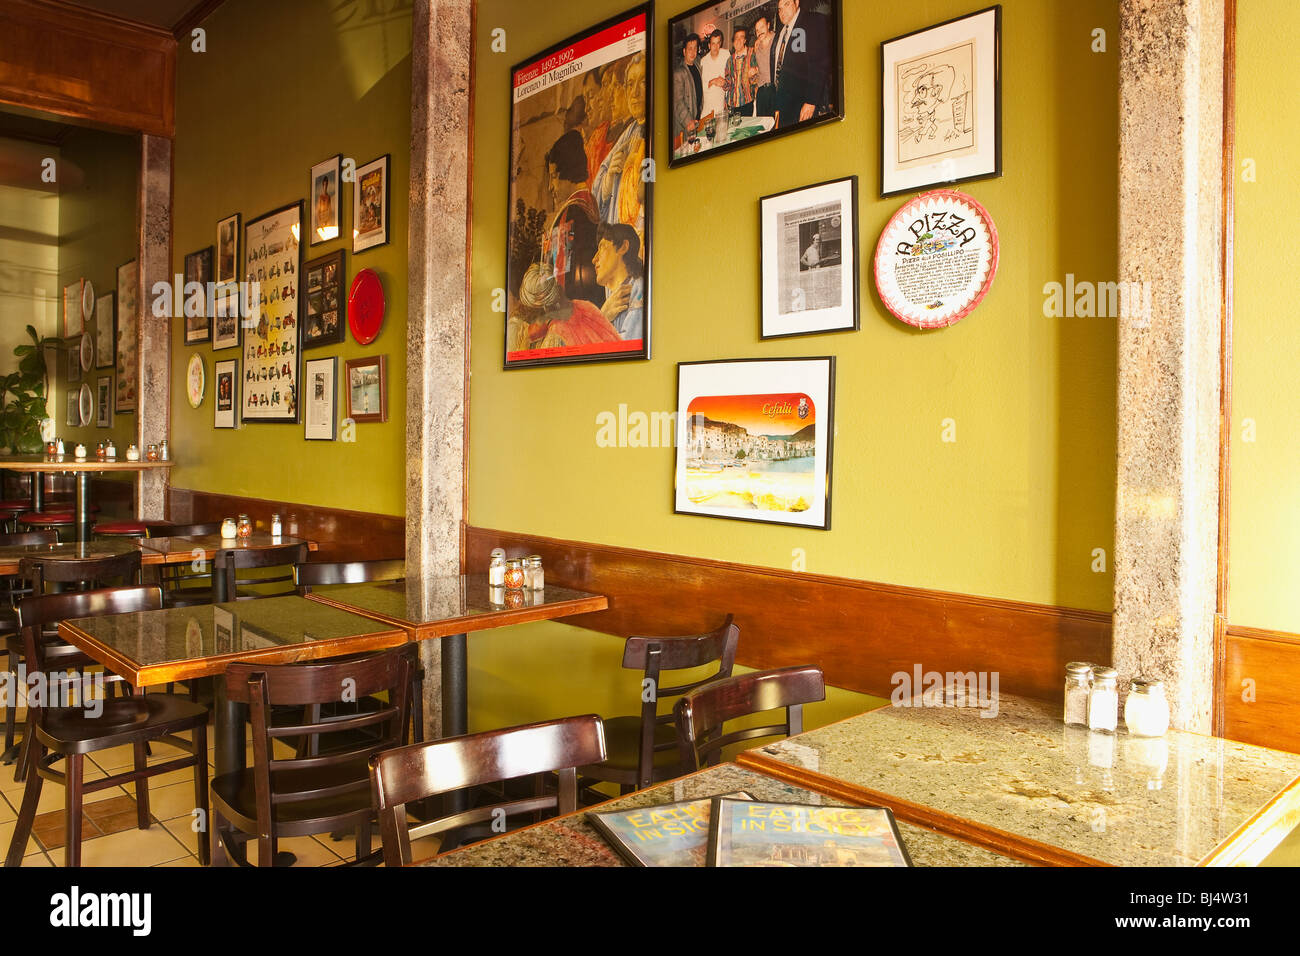 Italian restaurant interior stock photos